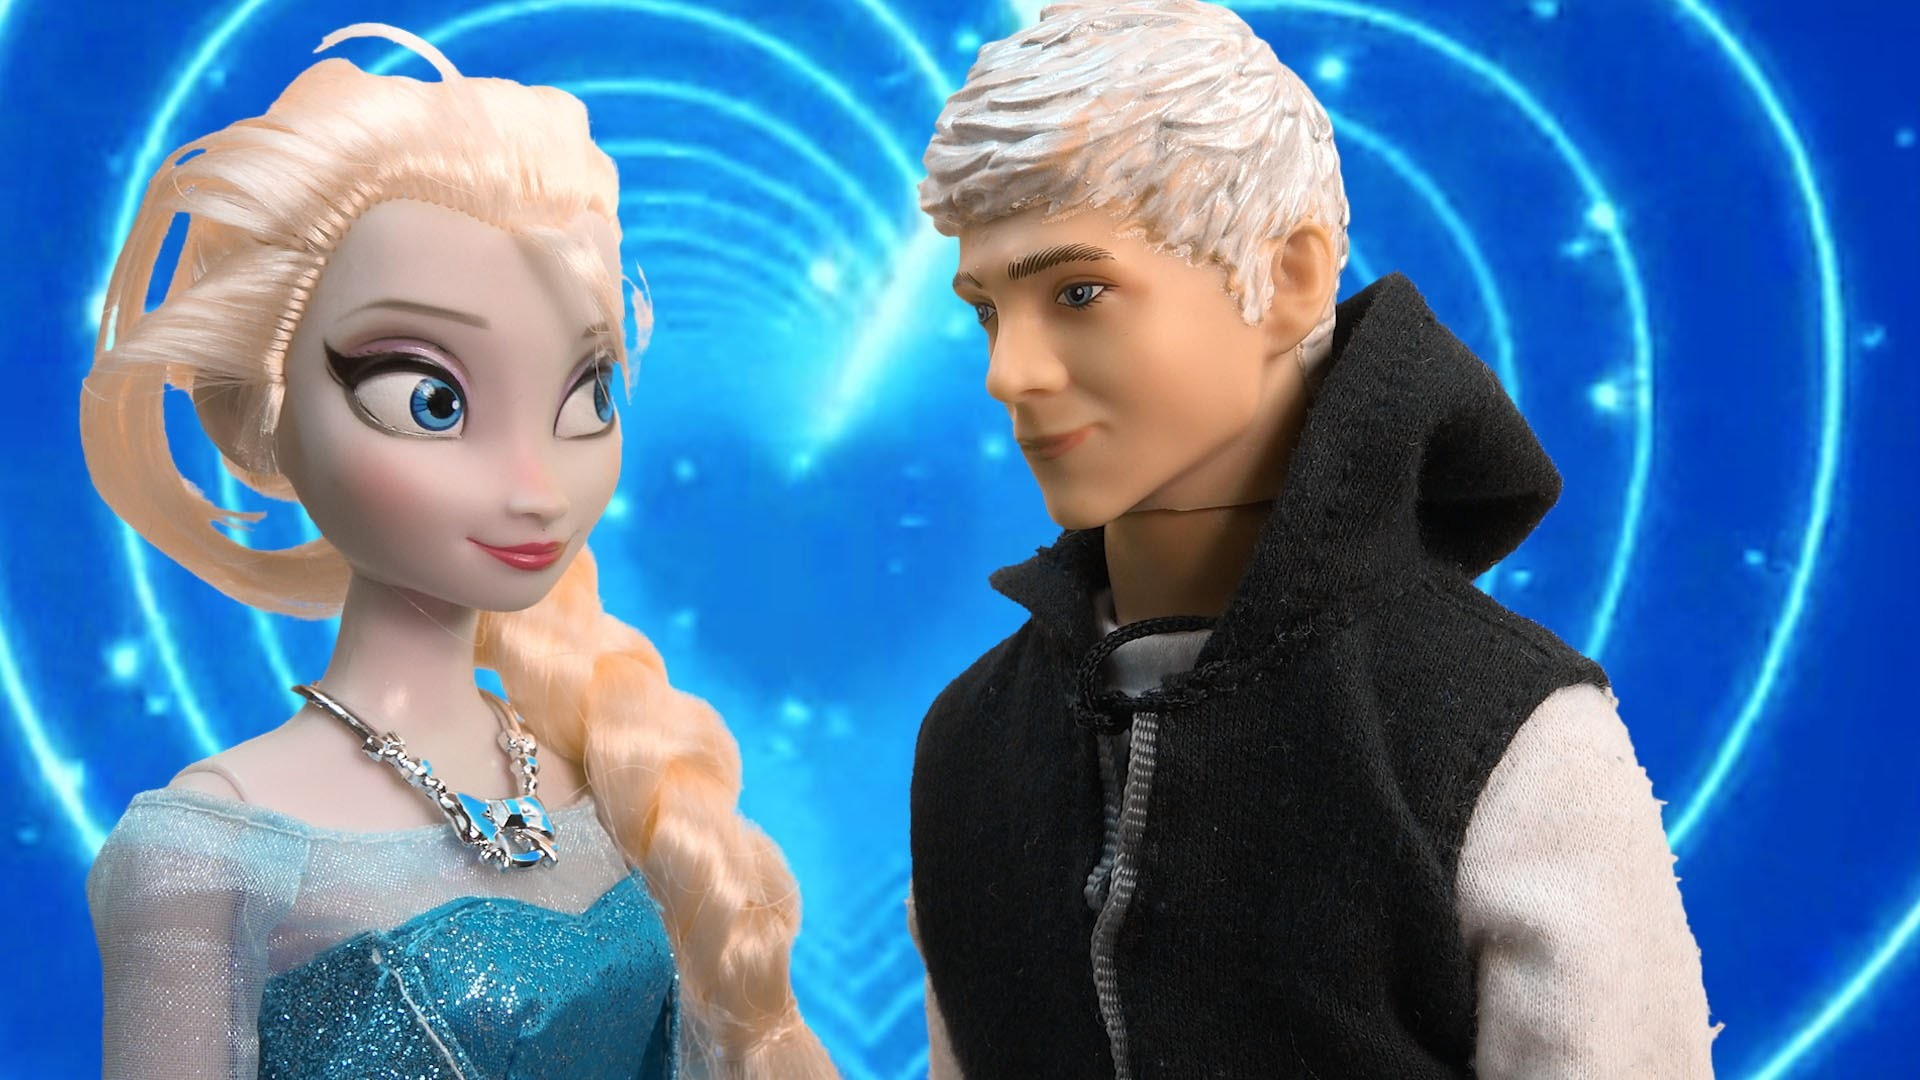 Queen Elsa Disney Frozen Meets Jack Frost Princess Anna Part 32 Dolls  Series Video Love Spell – YouTube